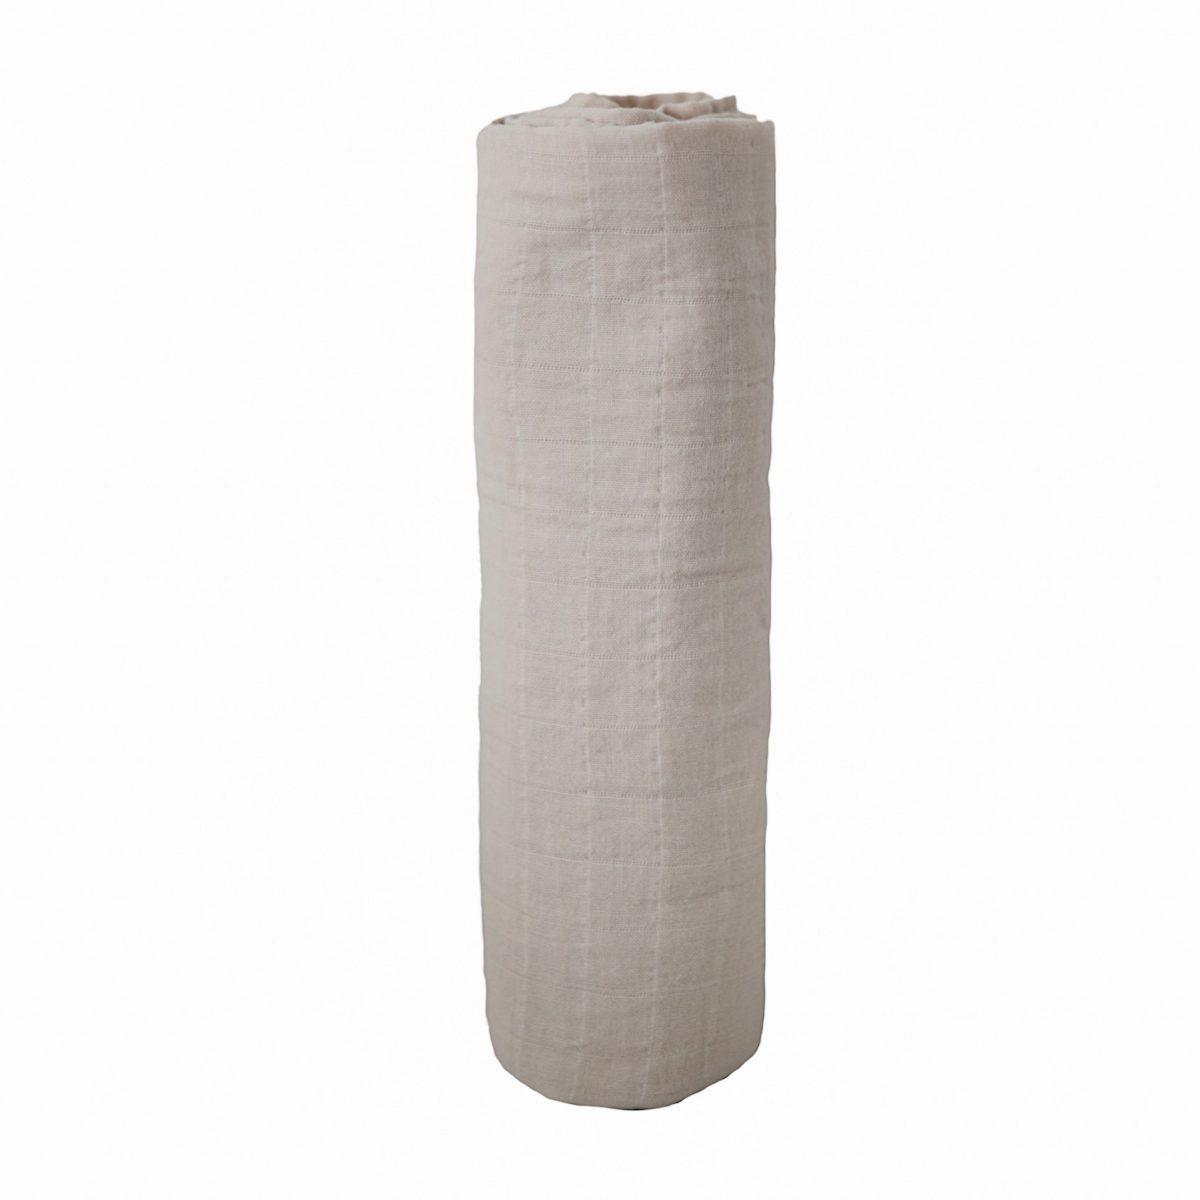 Mushie Swaddle Blanket - Fog alt